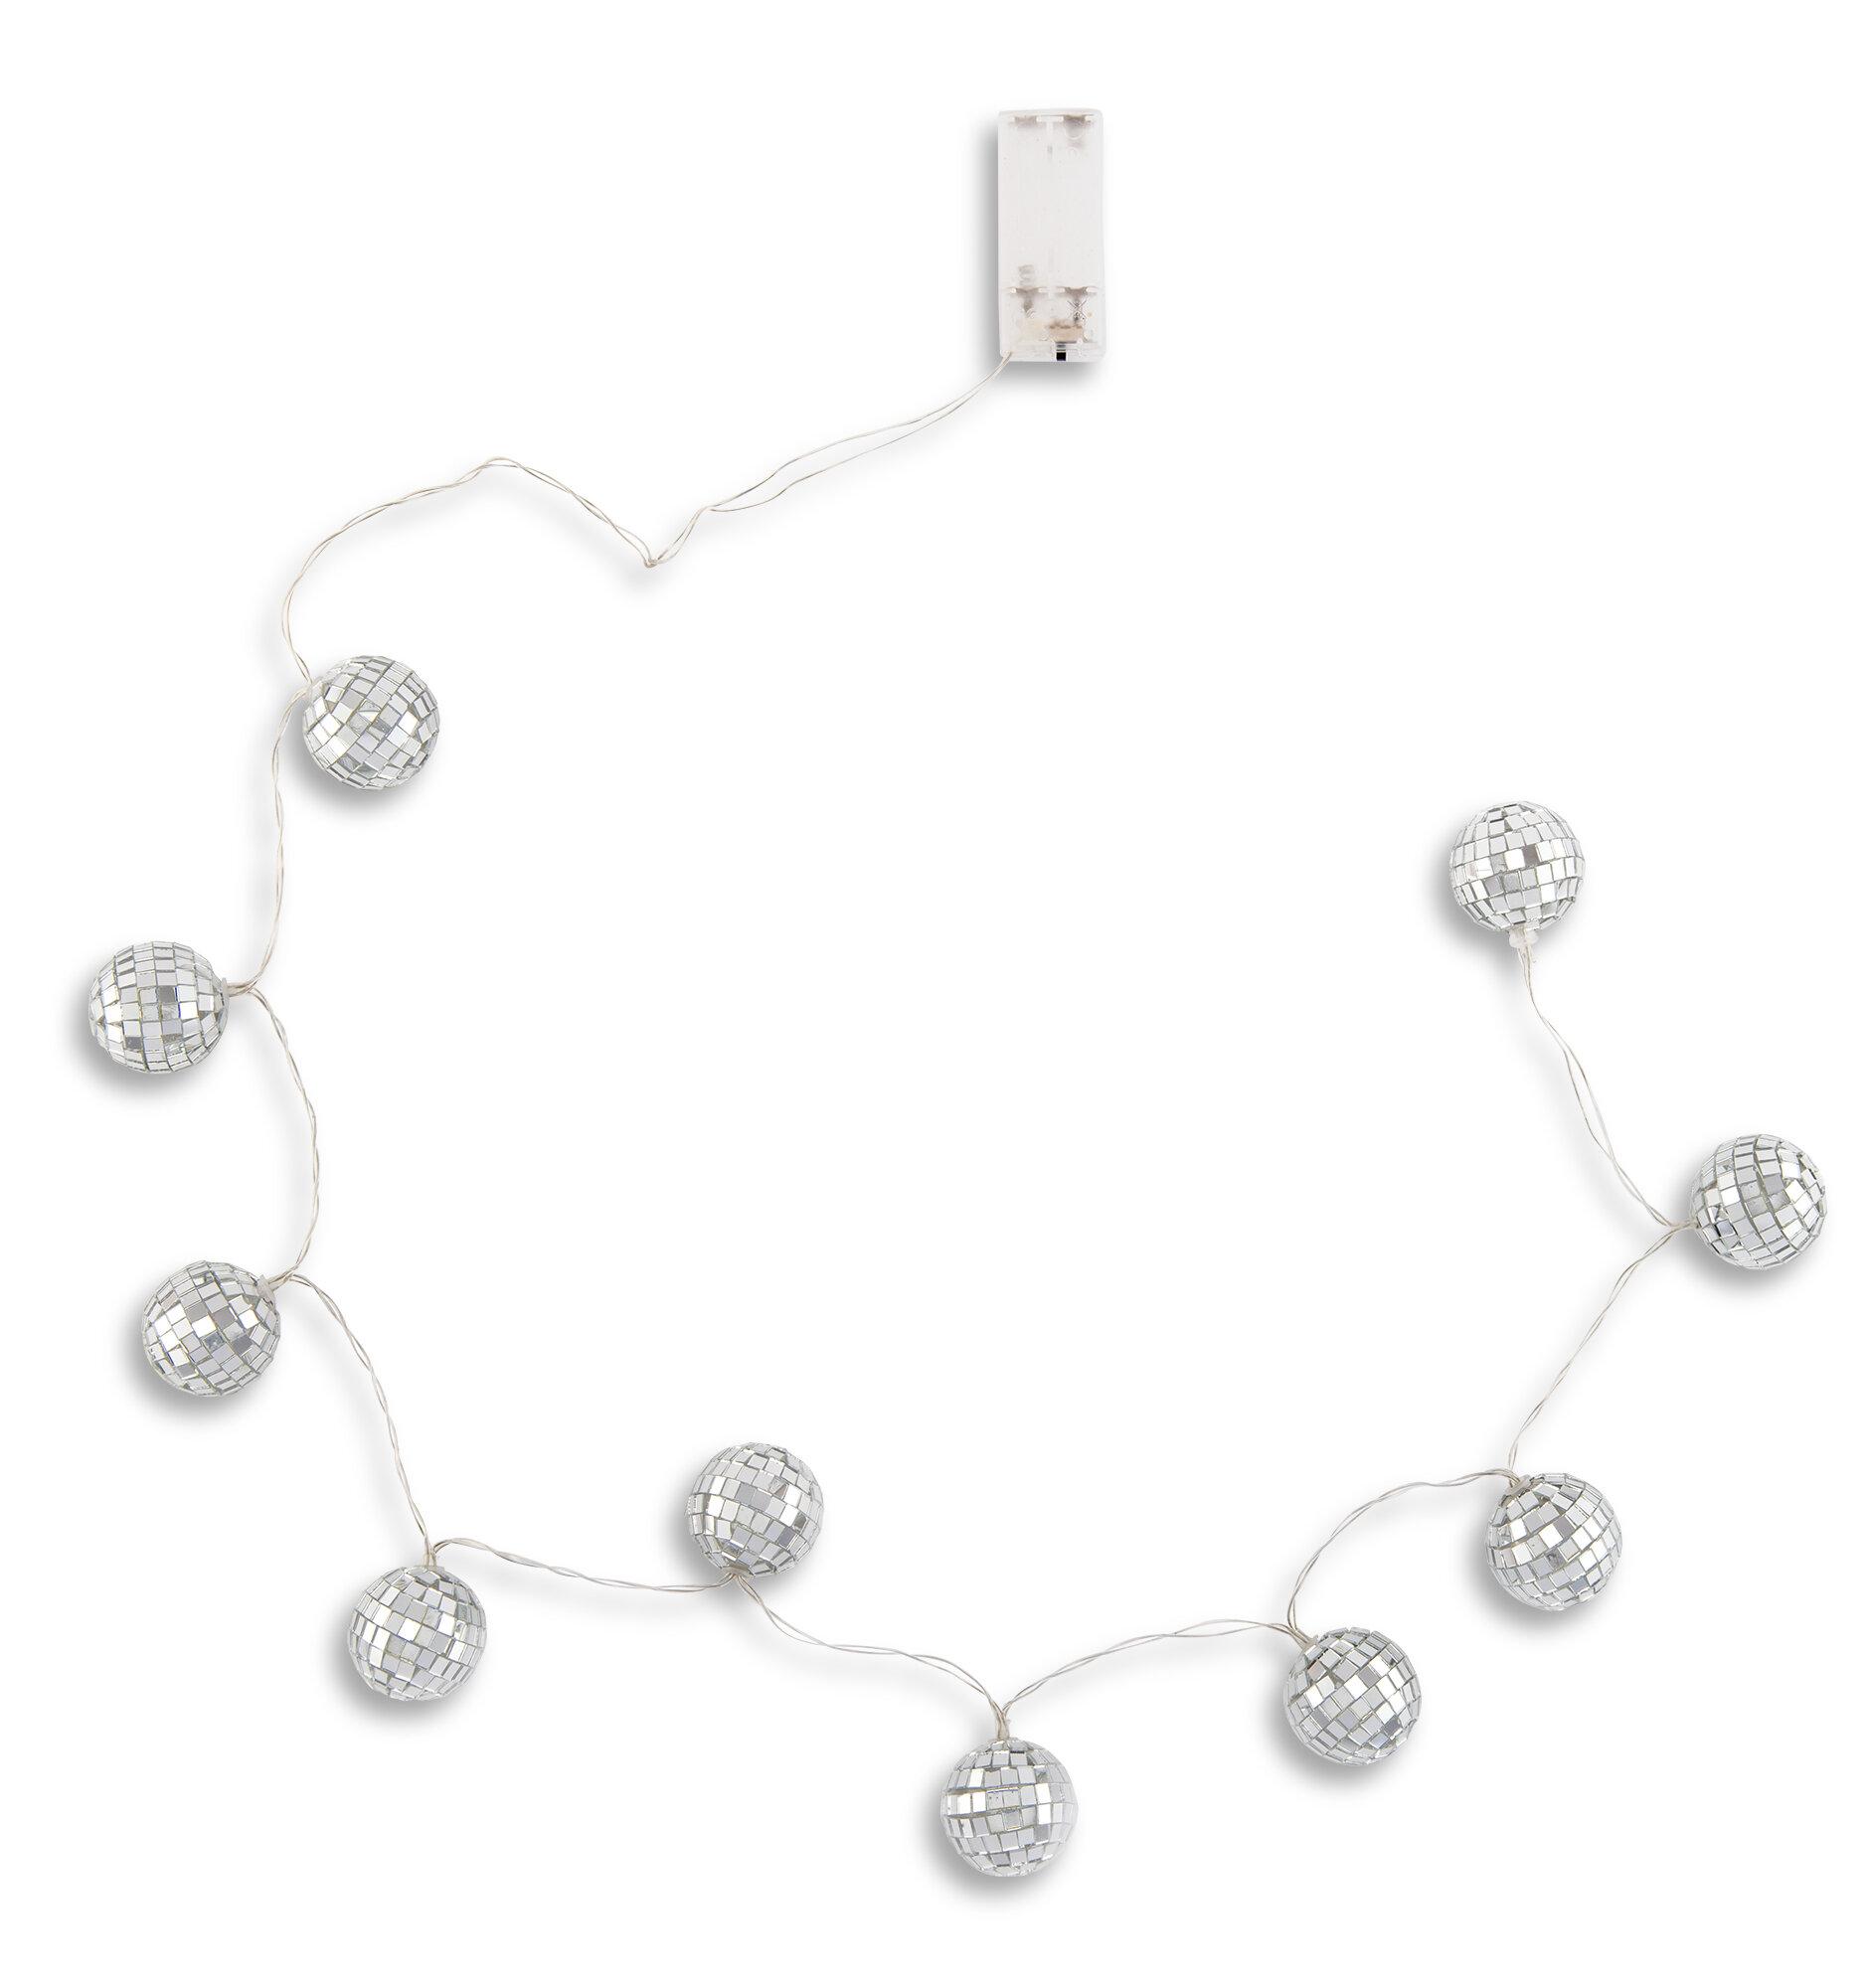 The Party Aisle Bourgeois 50 Outdoor Led 10 Bulb Novelty String Light Wayfair